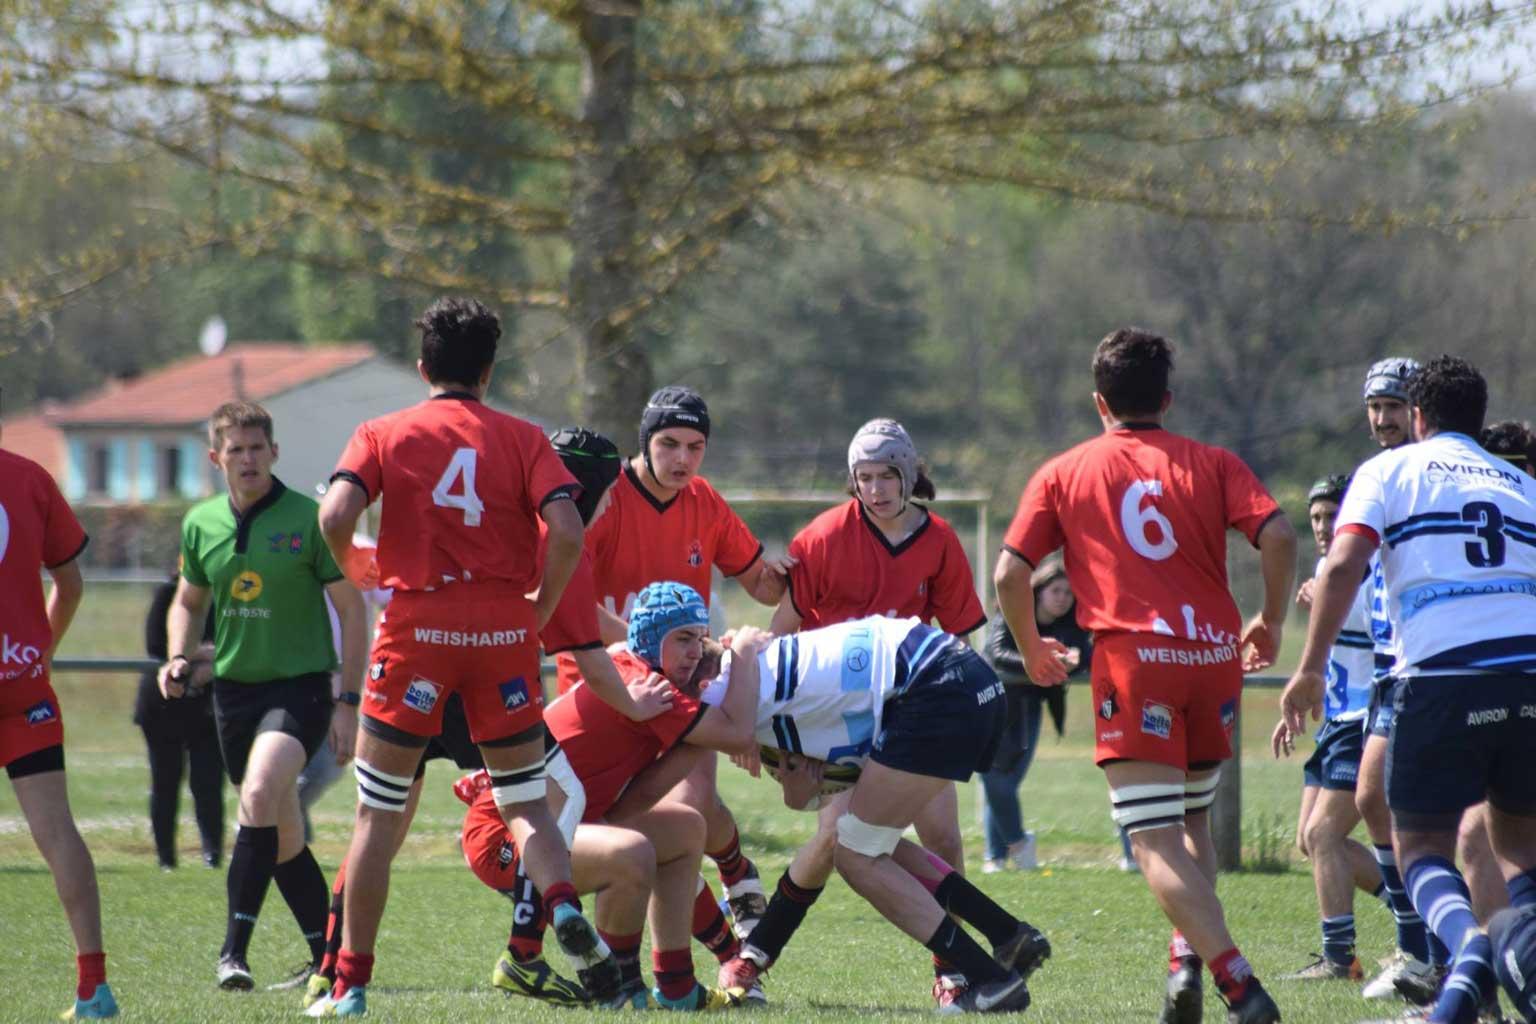 © 2019 Maeva Franco - U19 - S.C. Graulhet vs Aviron Castrais